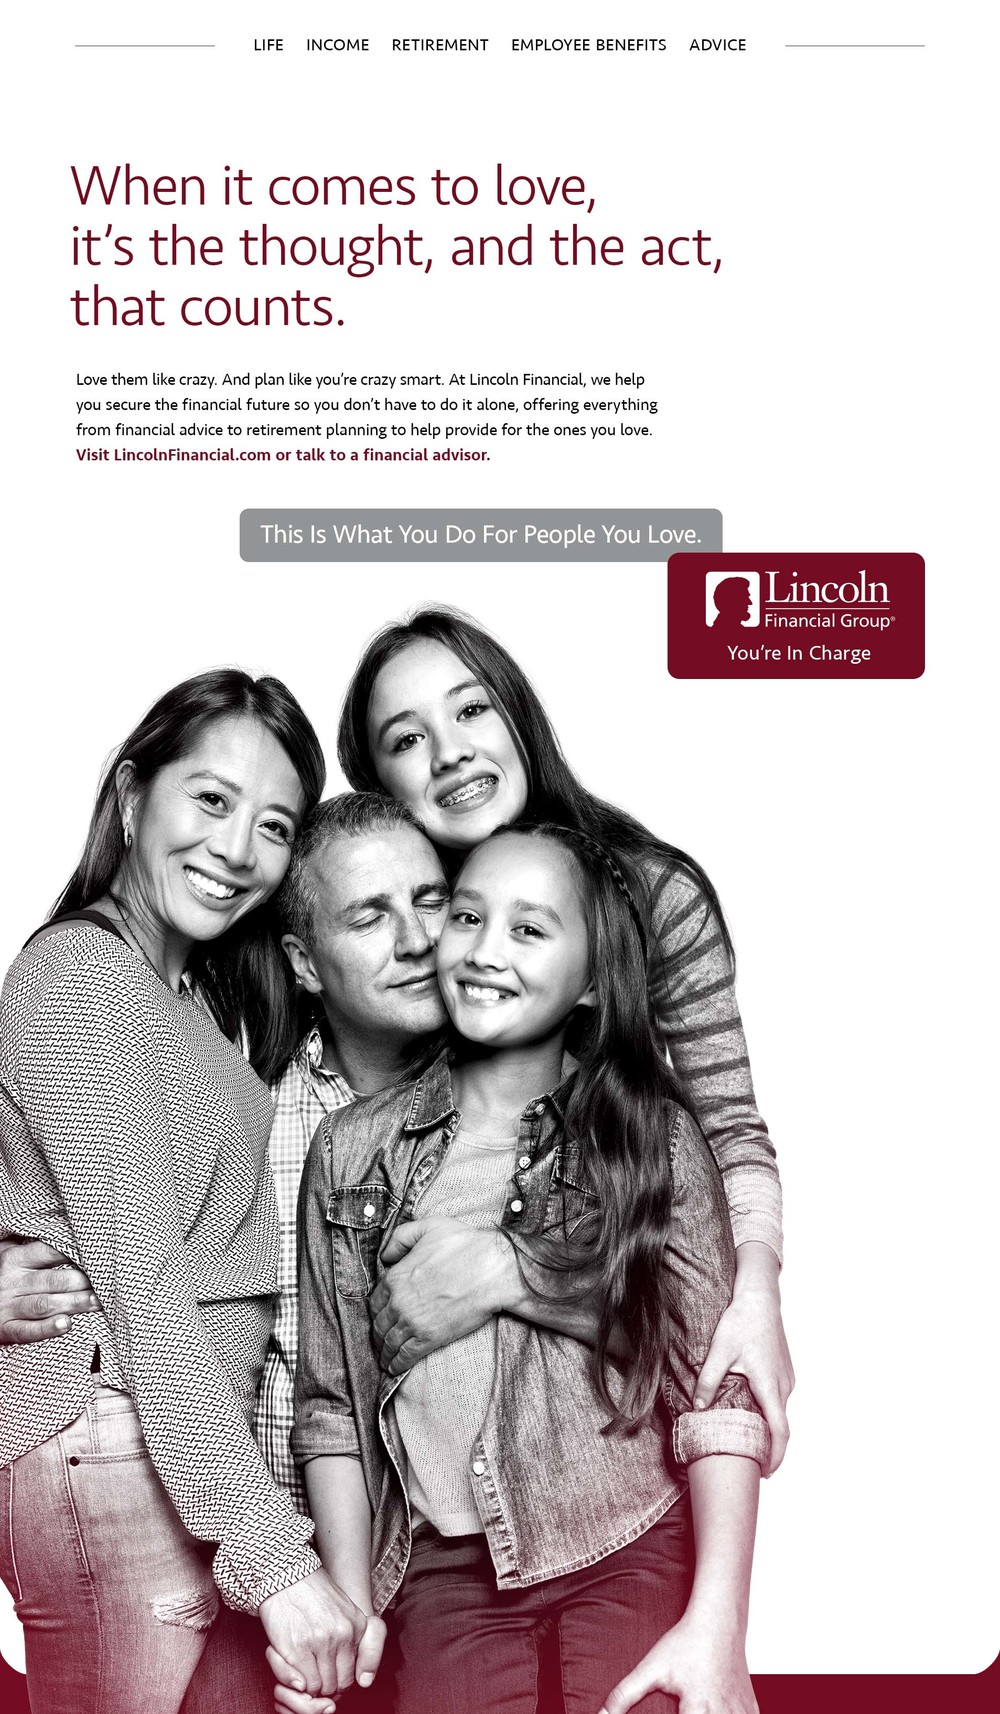 LF_PRINT_Multiracial family.jpg